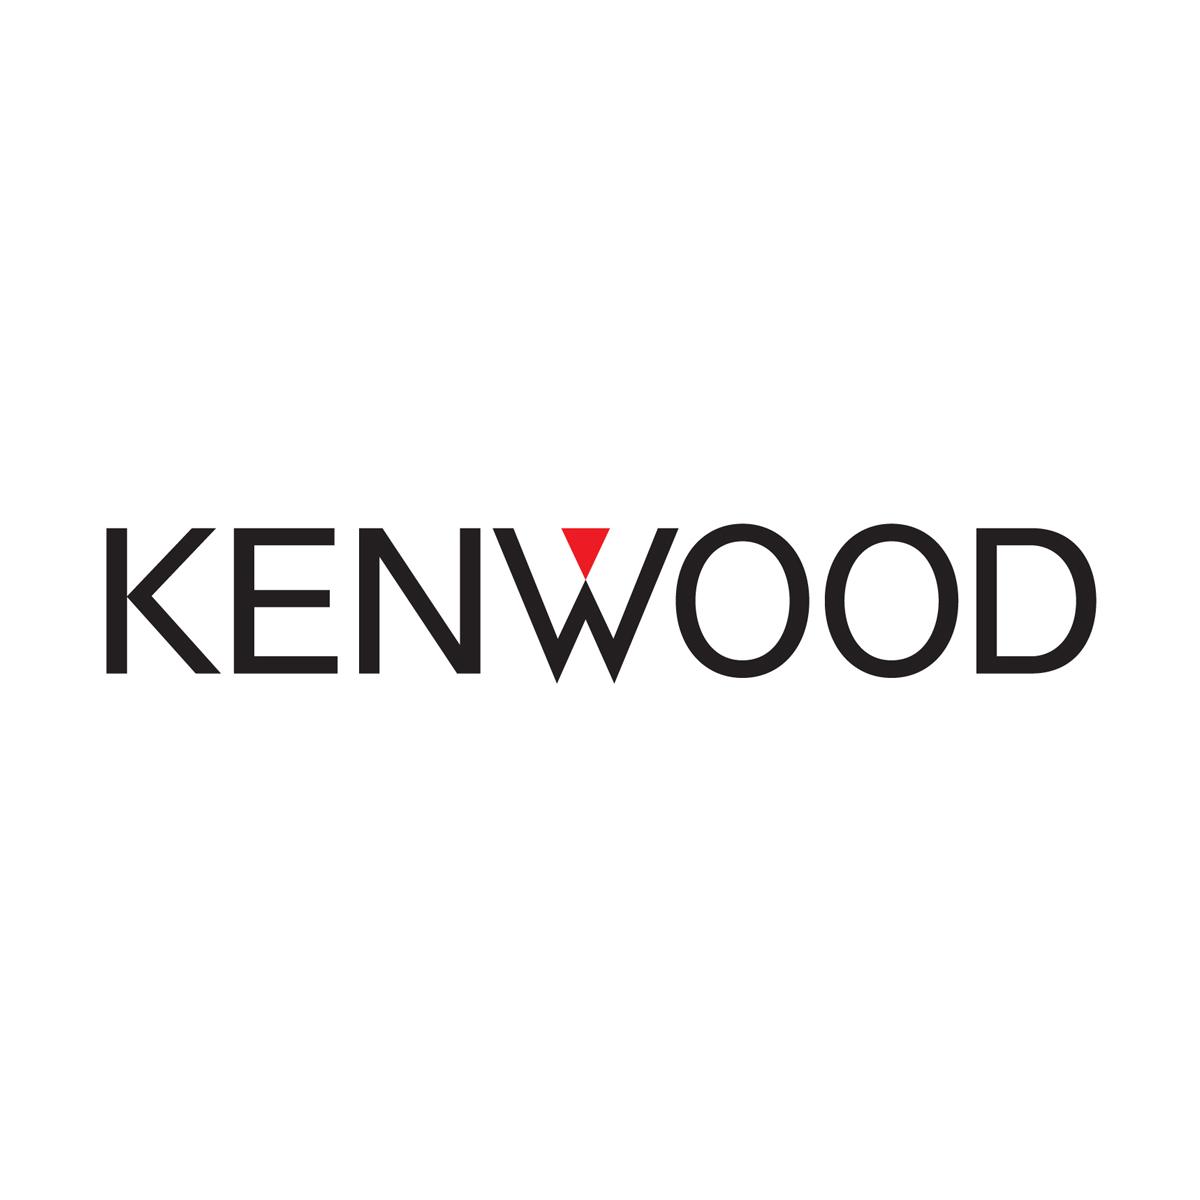 Kenwood brand wallpapers HD